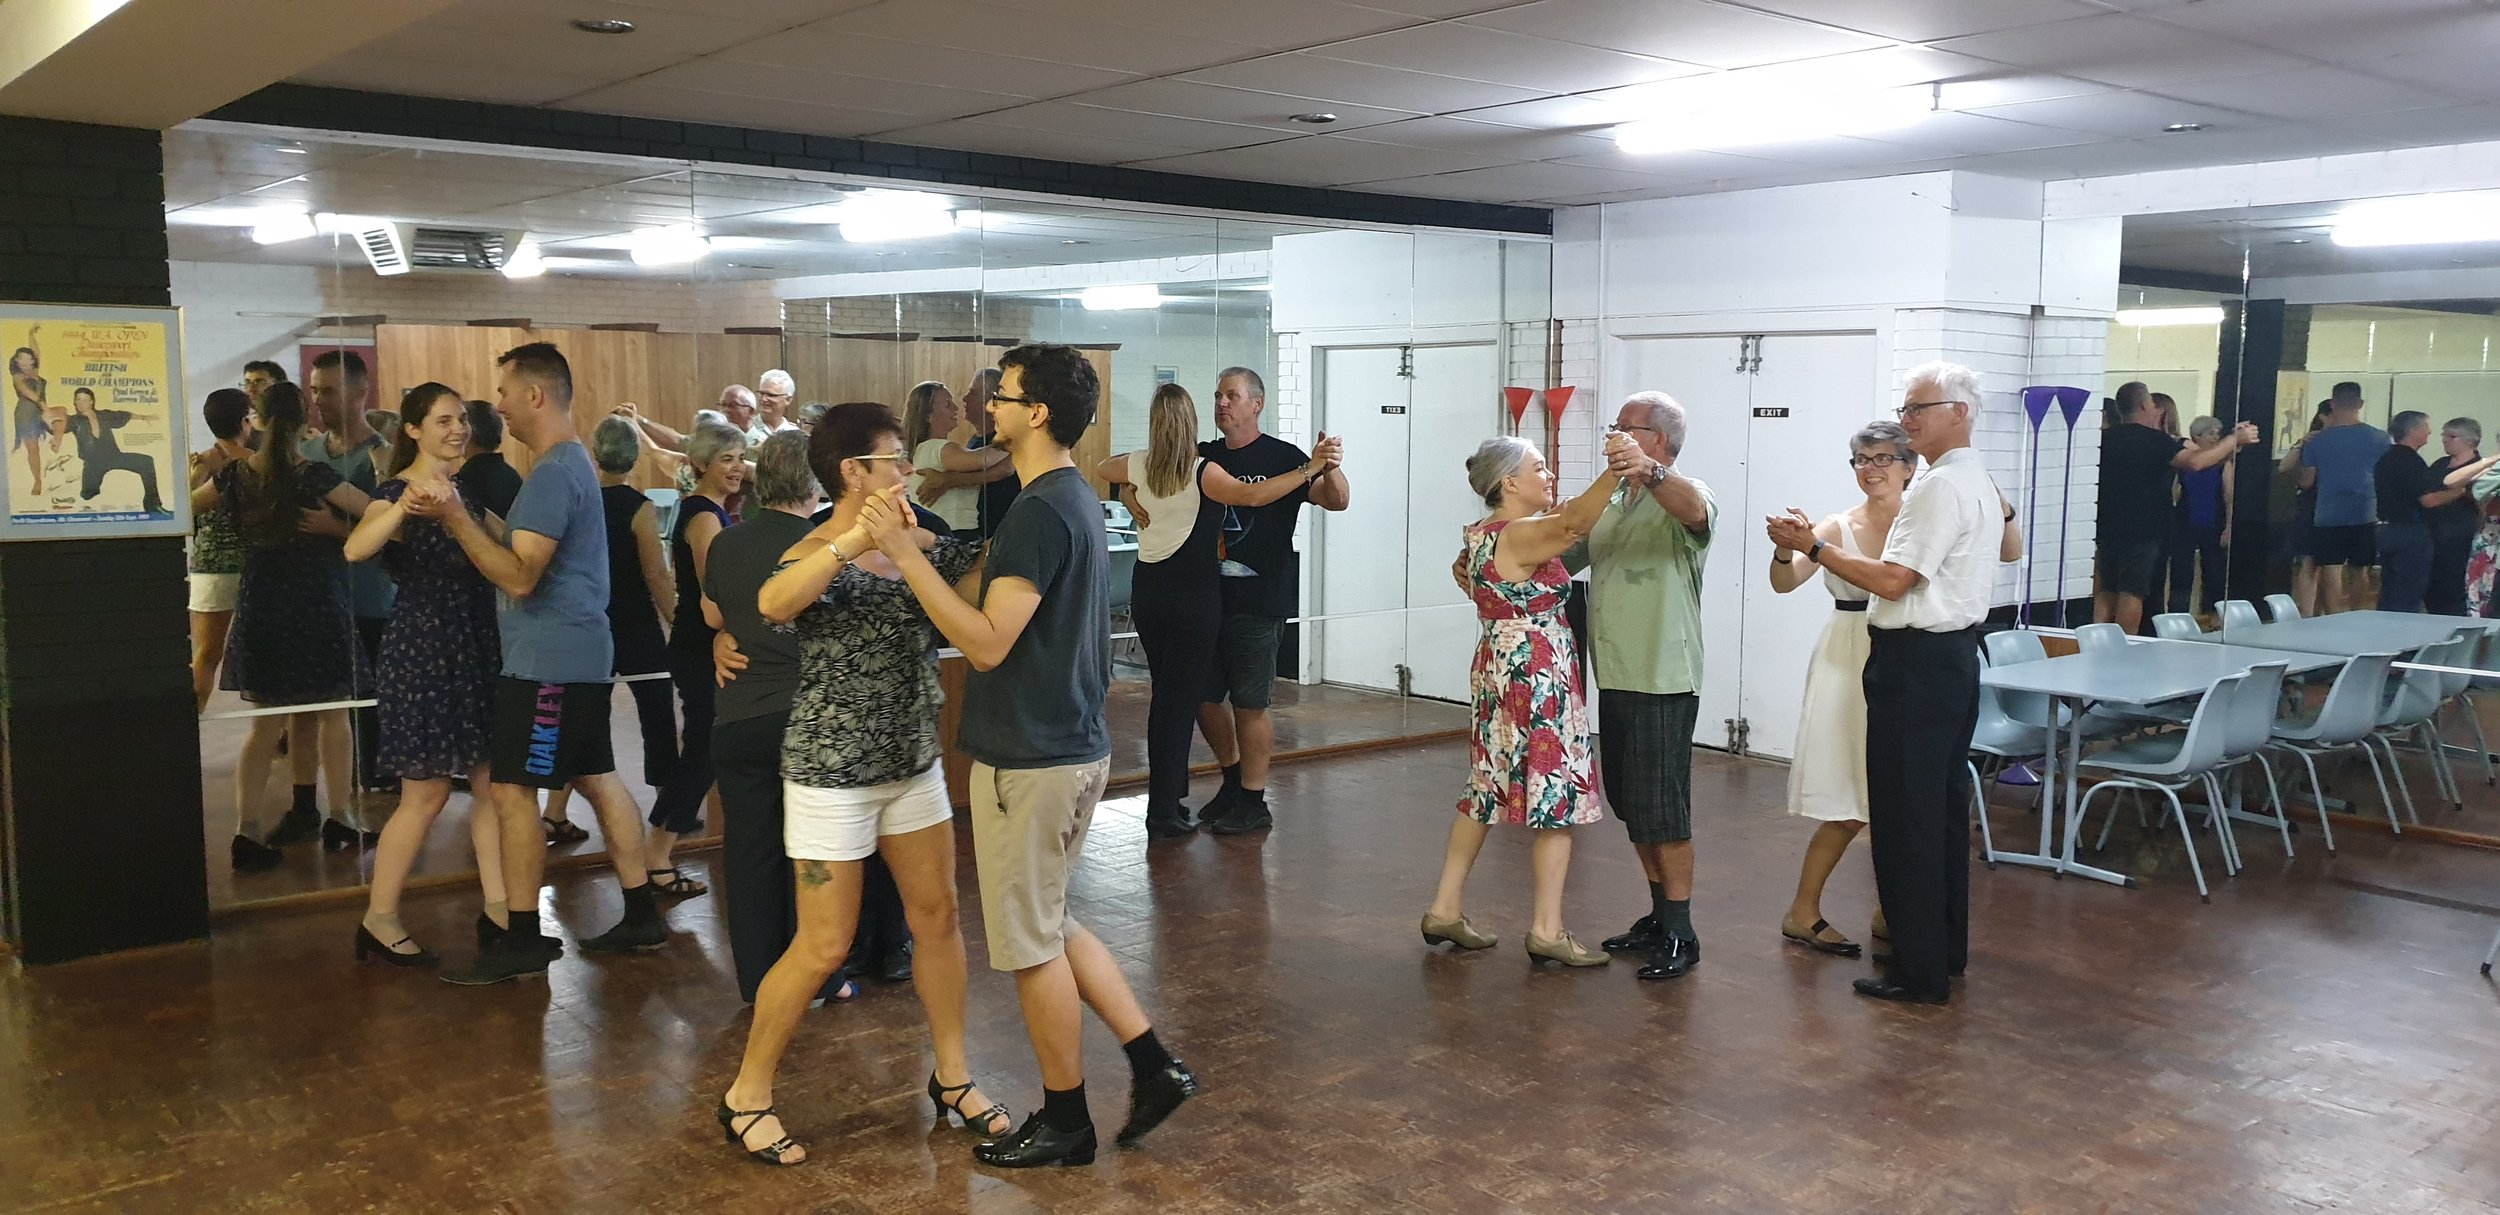 chisholm dance_adult beginners dance classes_wangarra.jpg